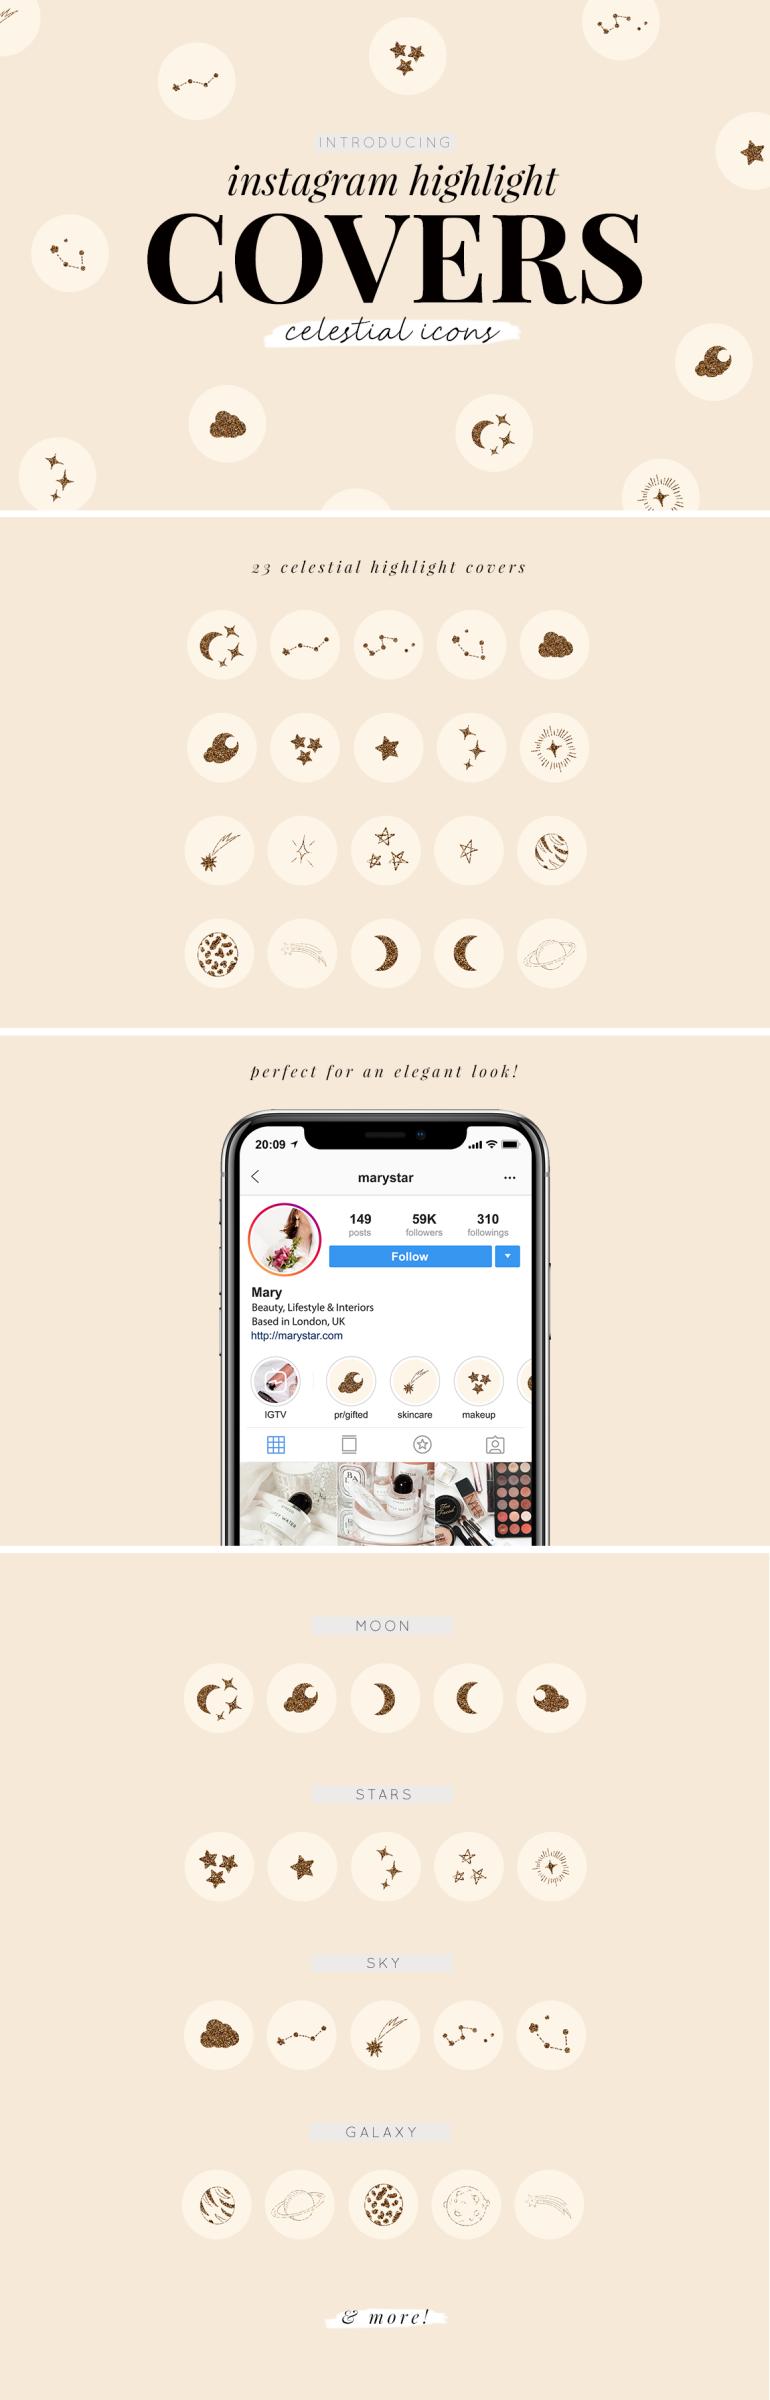 instagram highlight covers - new lune studio - celestial icons - gold glitter